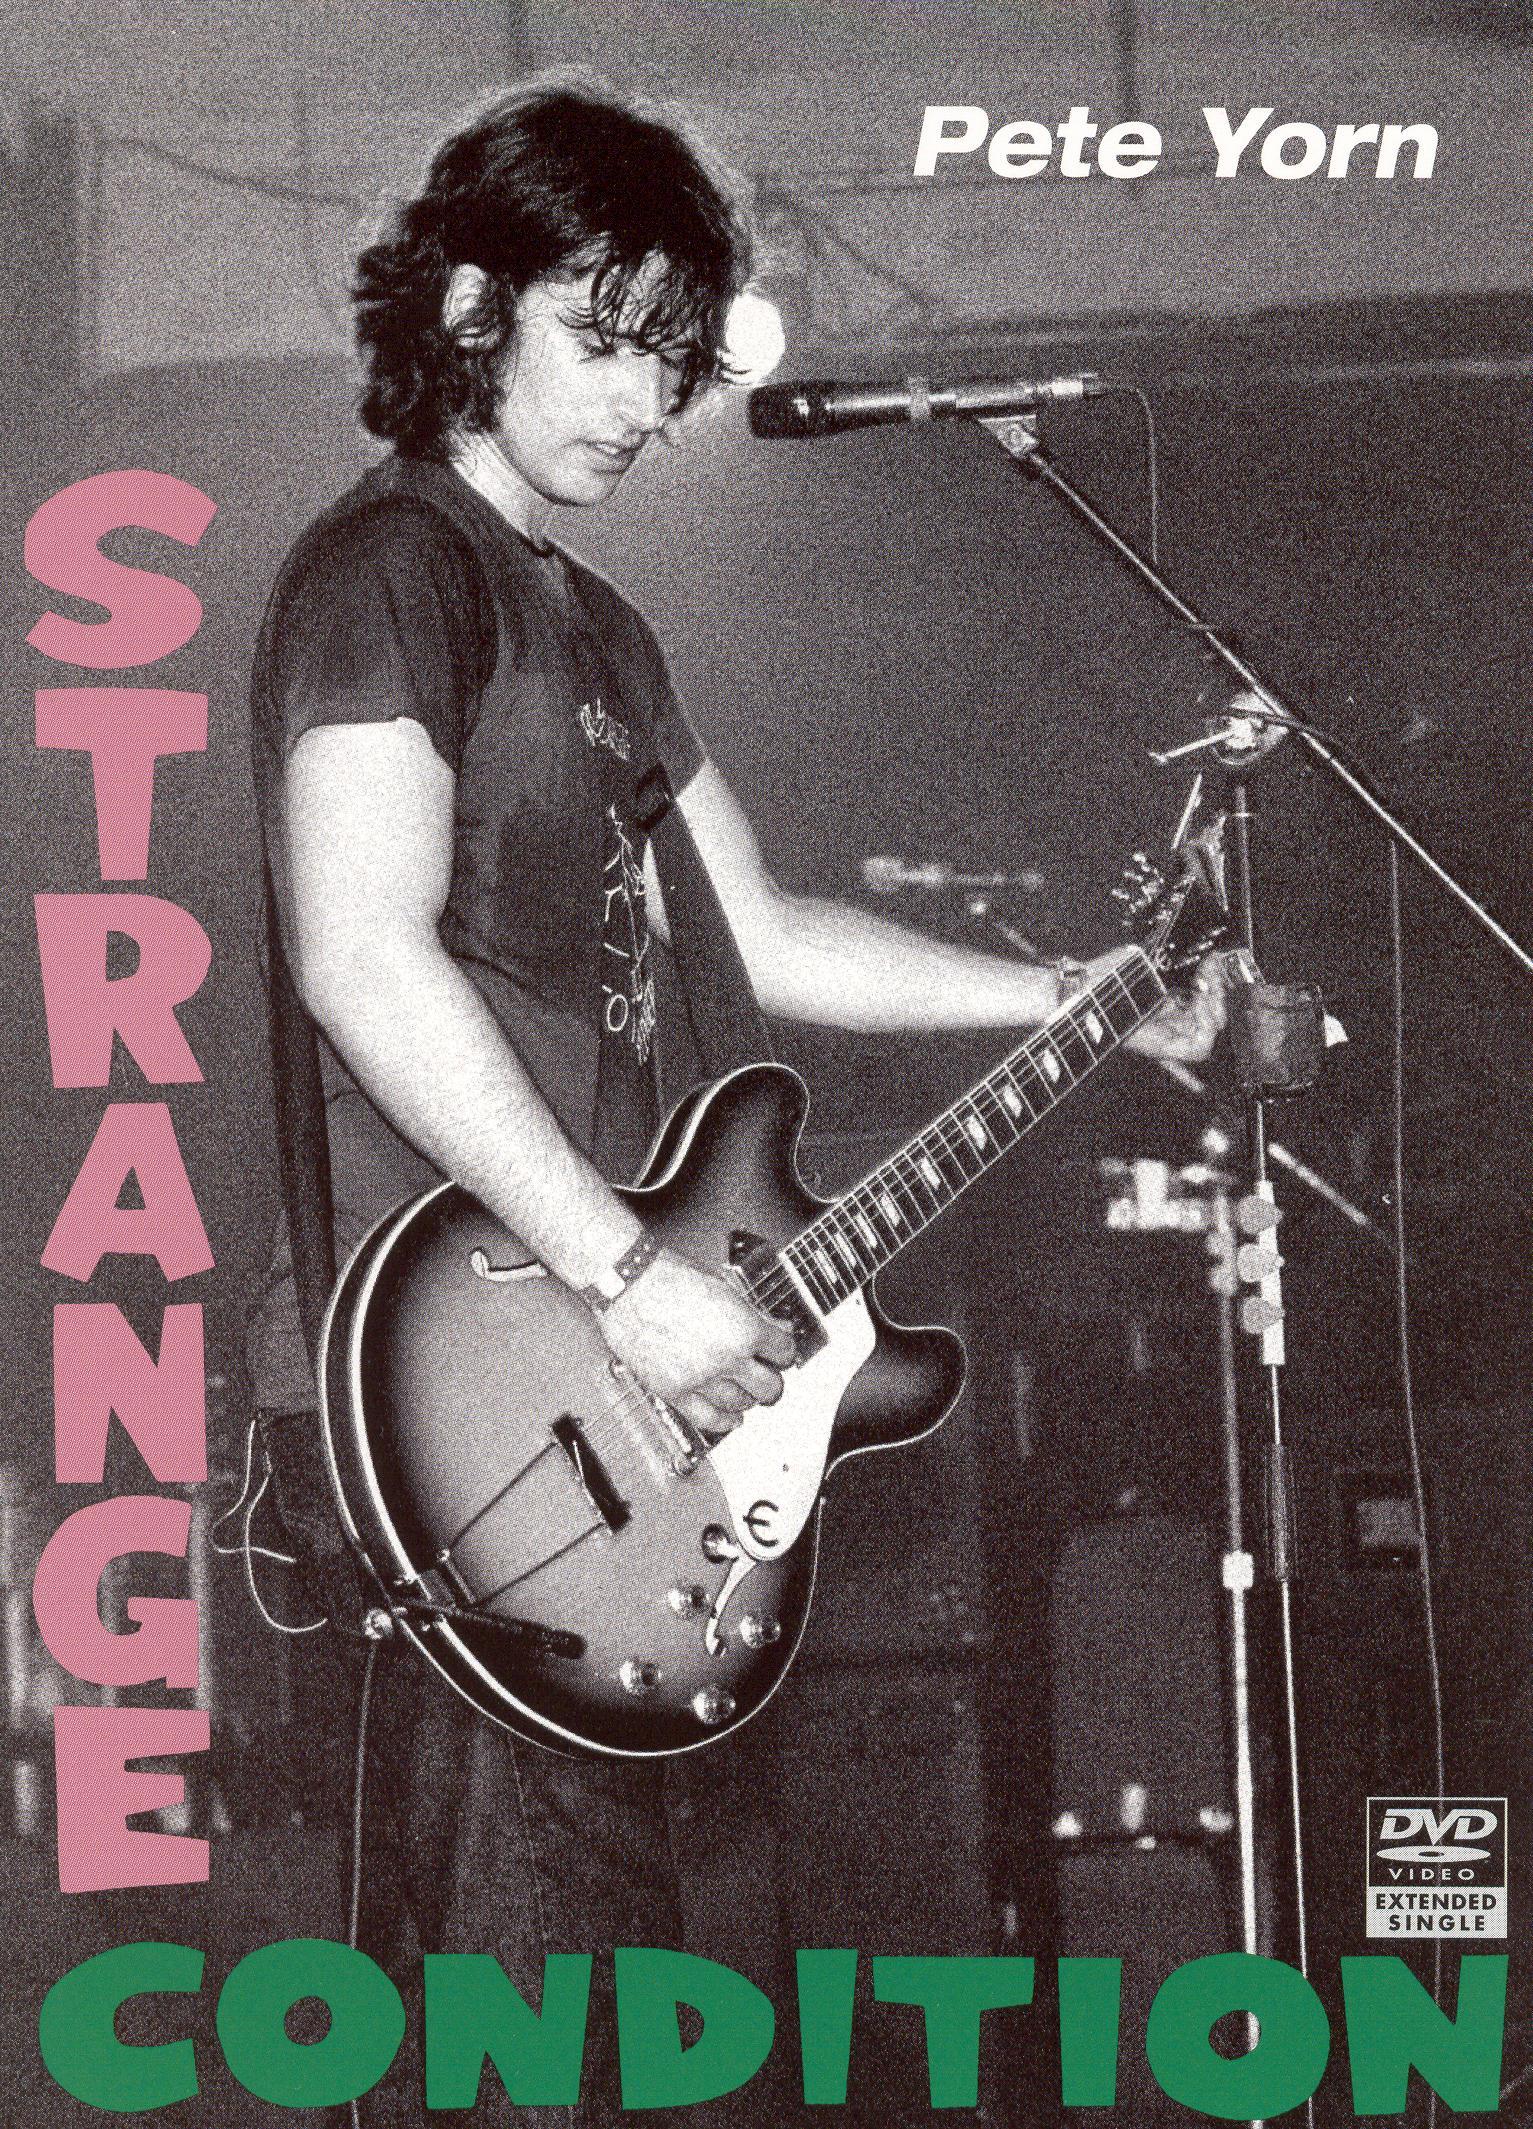 Pete Yorn: Strange Condition  [DVD Single]